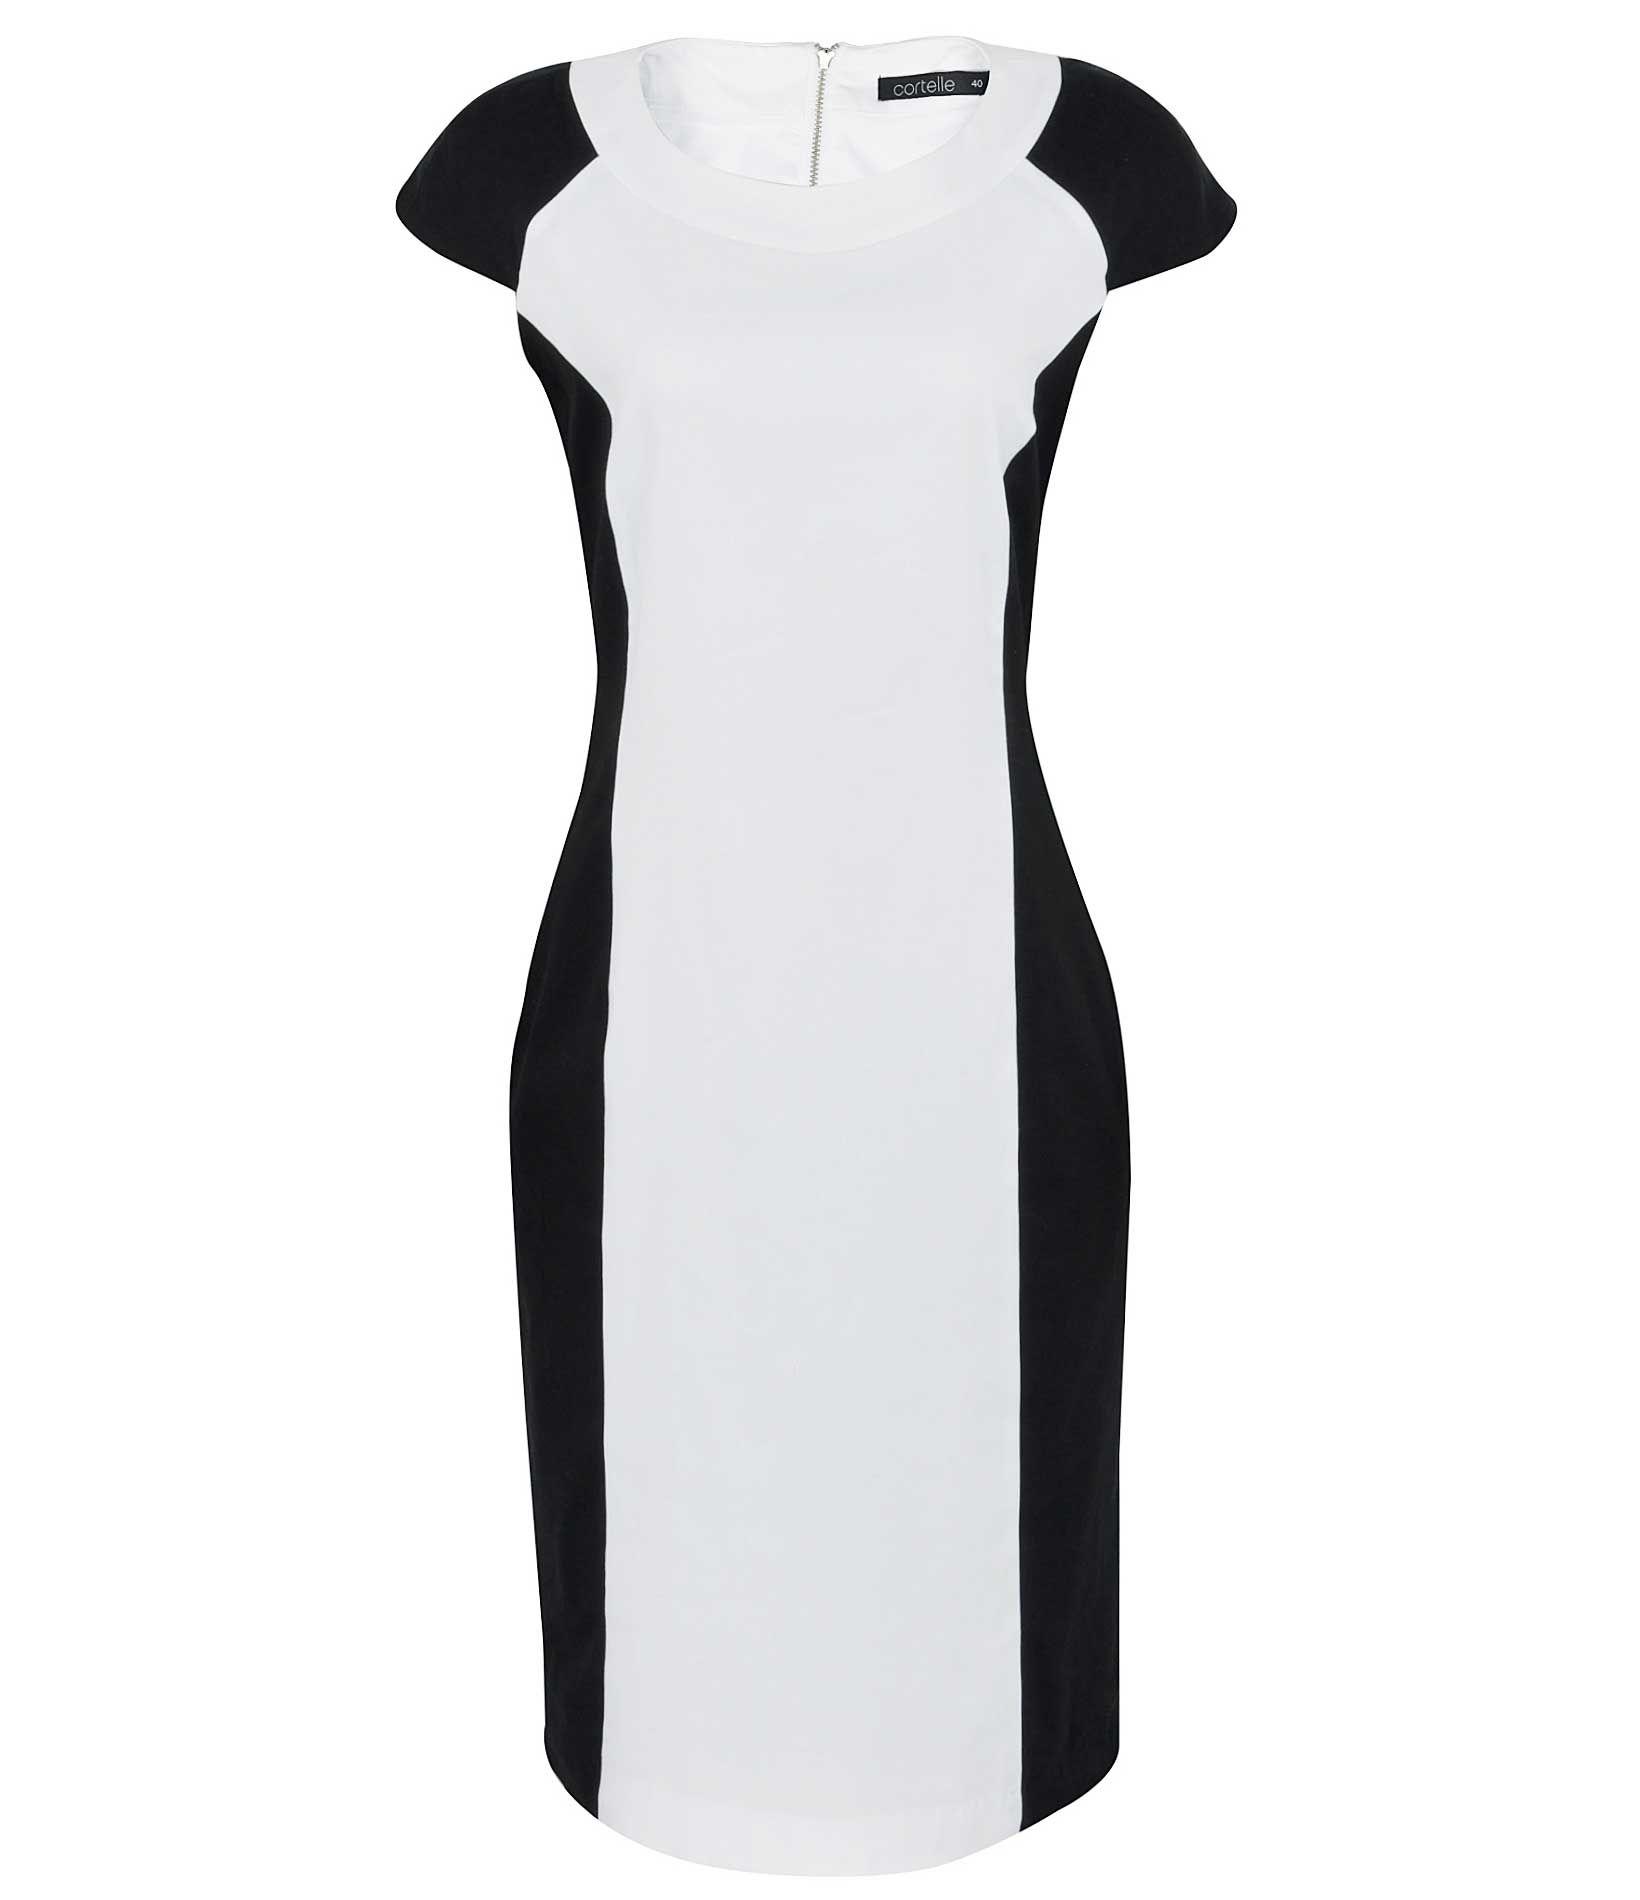 silhouette | Vestidos | Pinterest